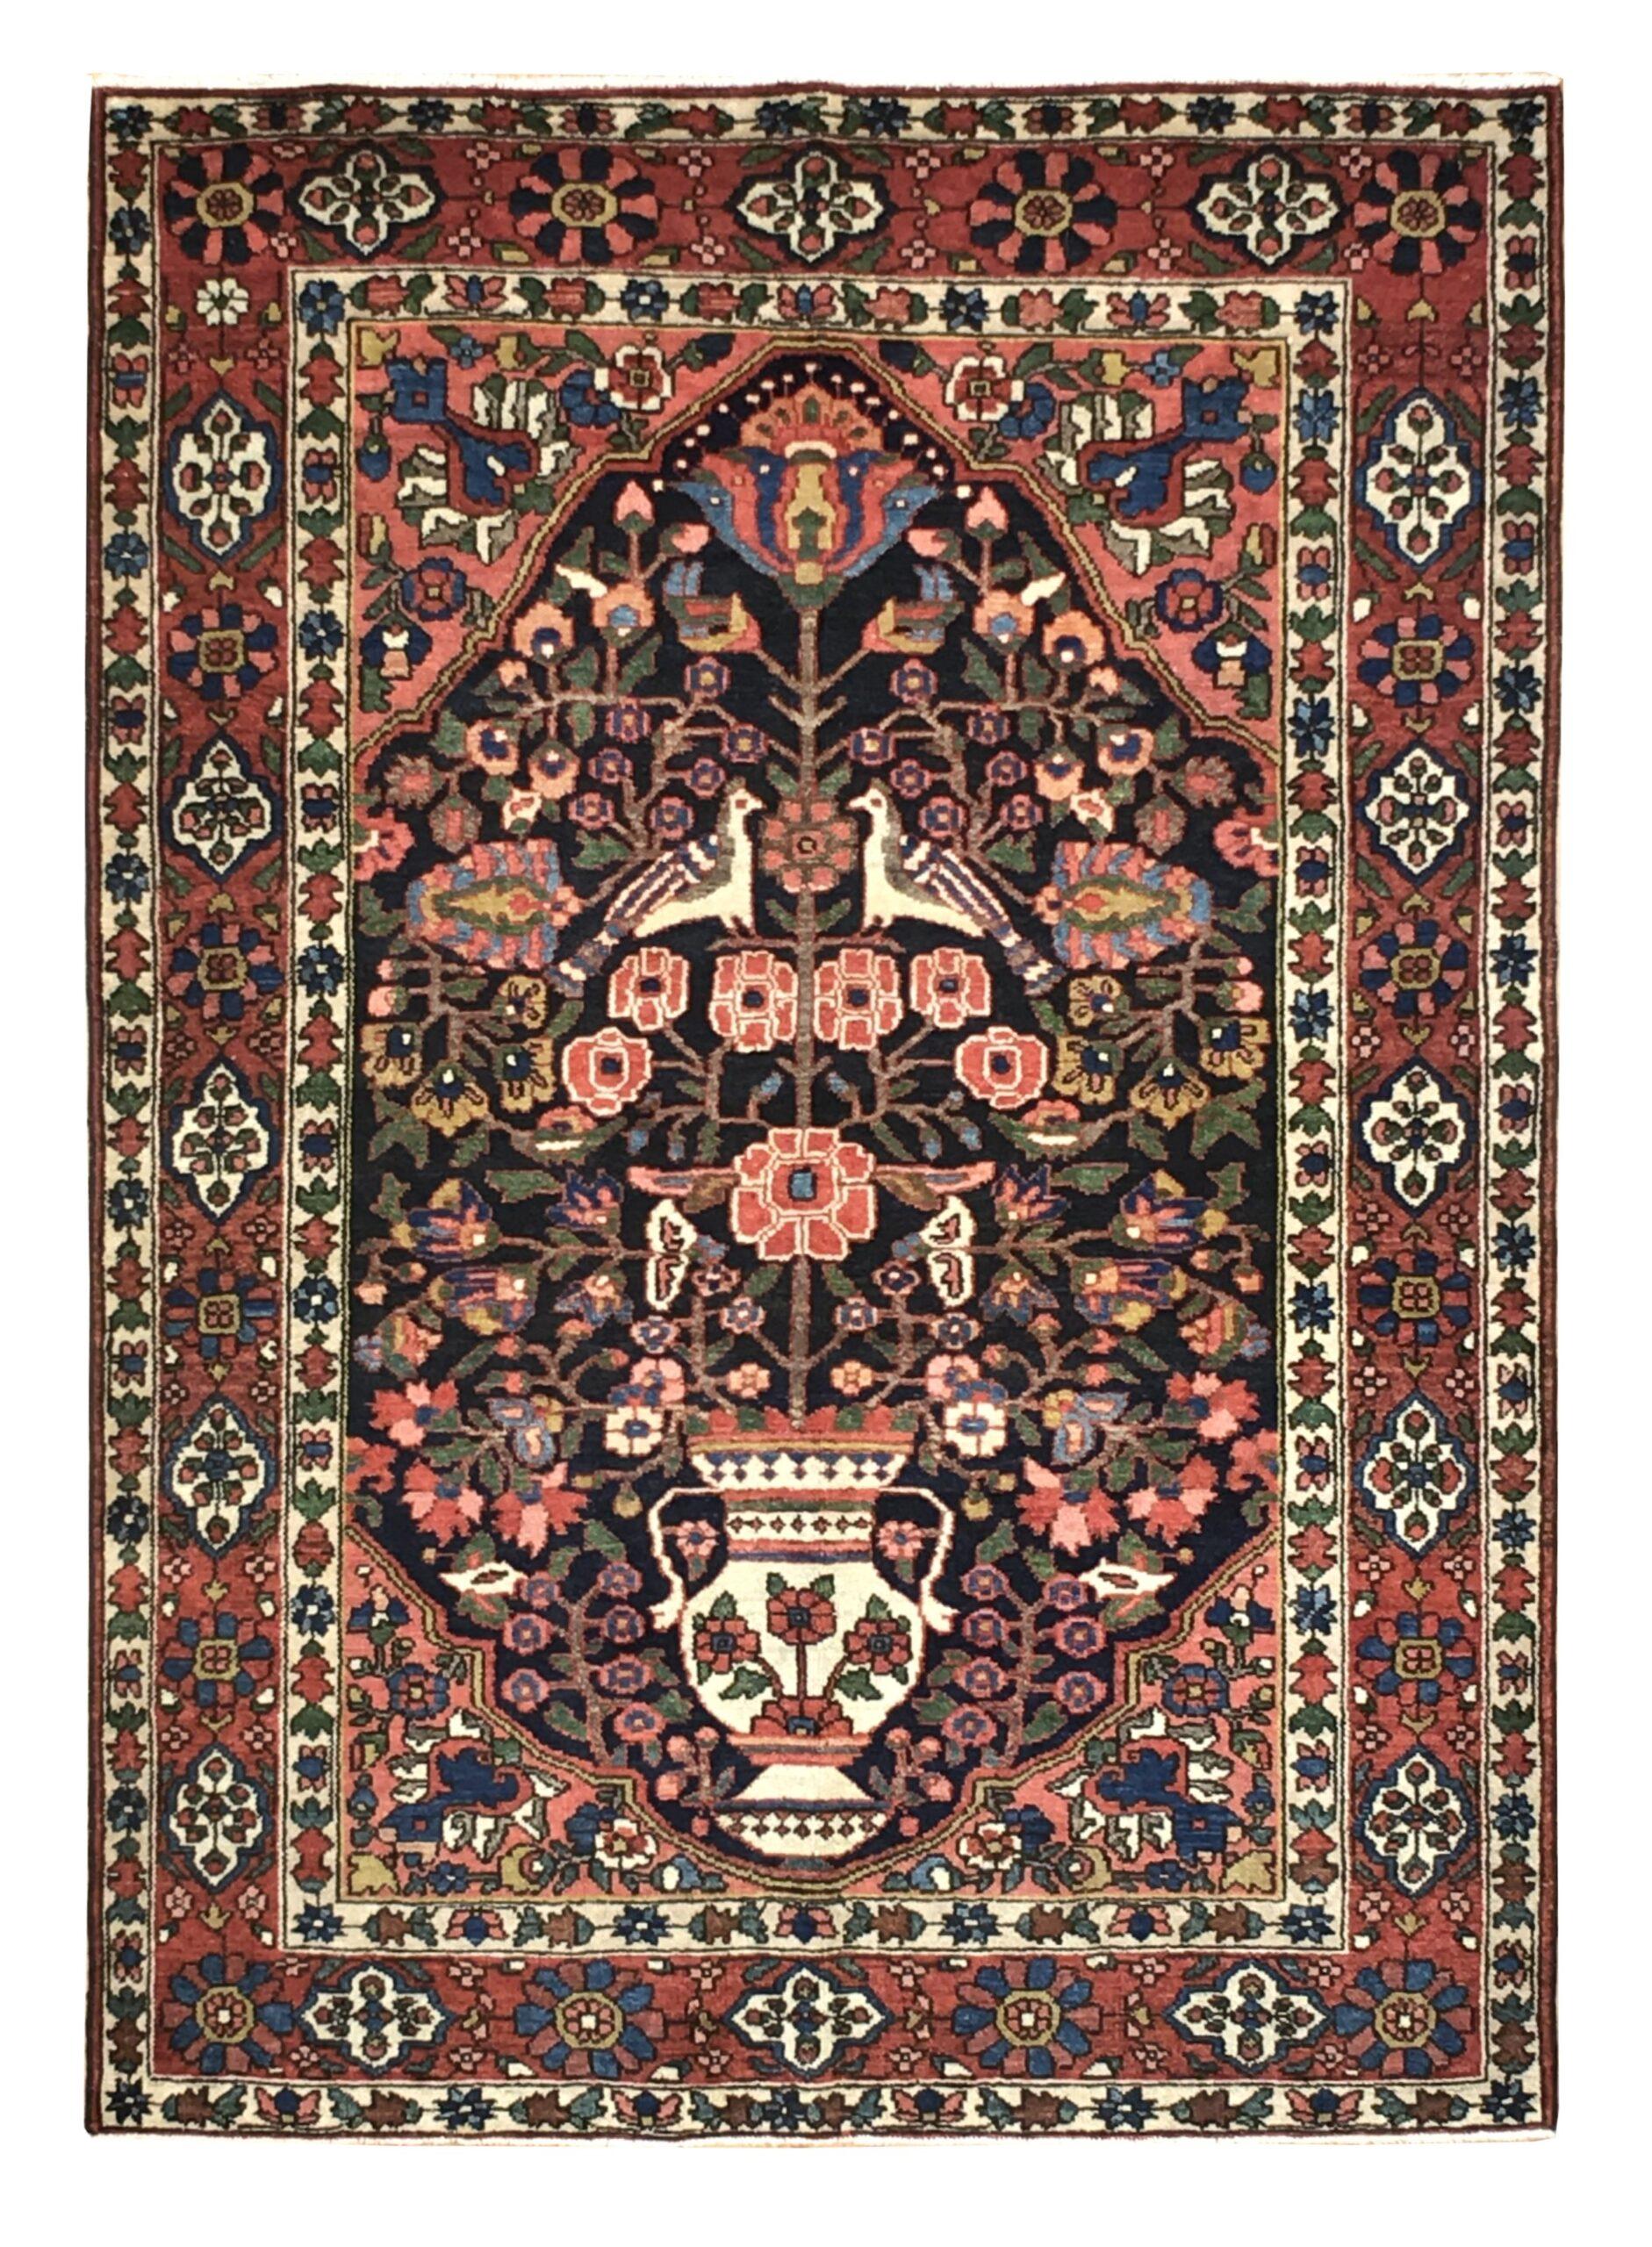 "Antique Persian Bakhtiari 4' 10"" x 6' 10"" Handmade Wool Area Rug - Shabahang Royal Carpet"